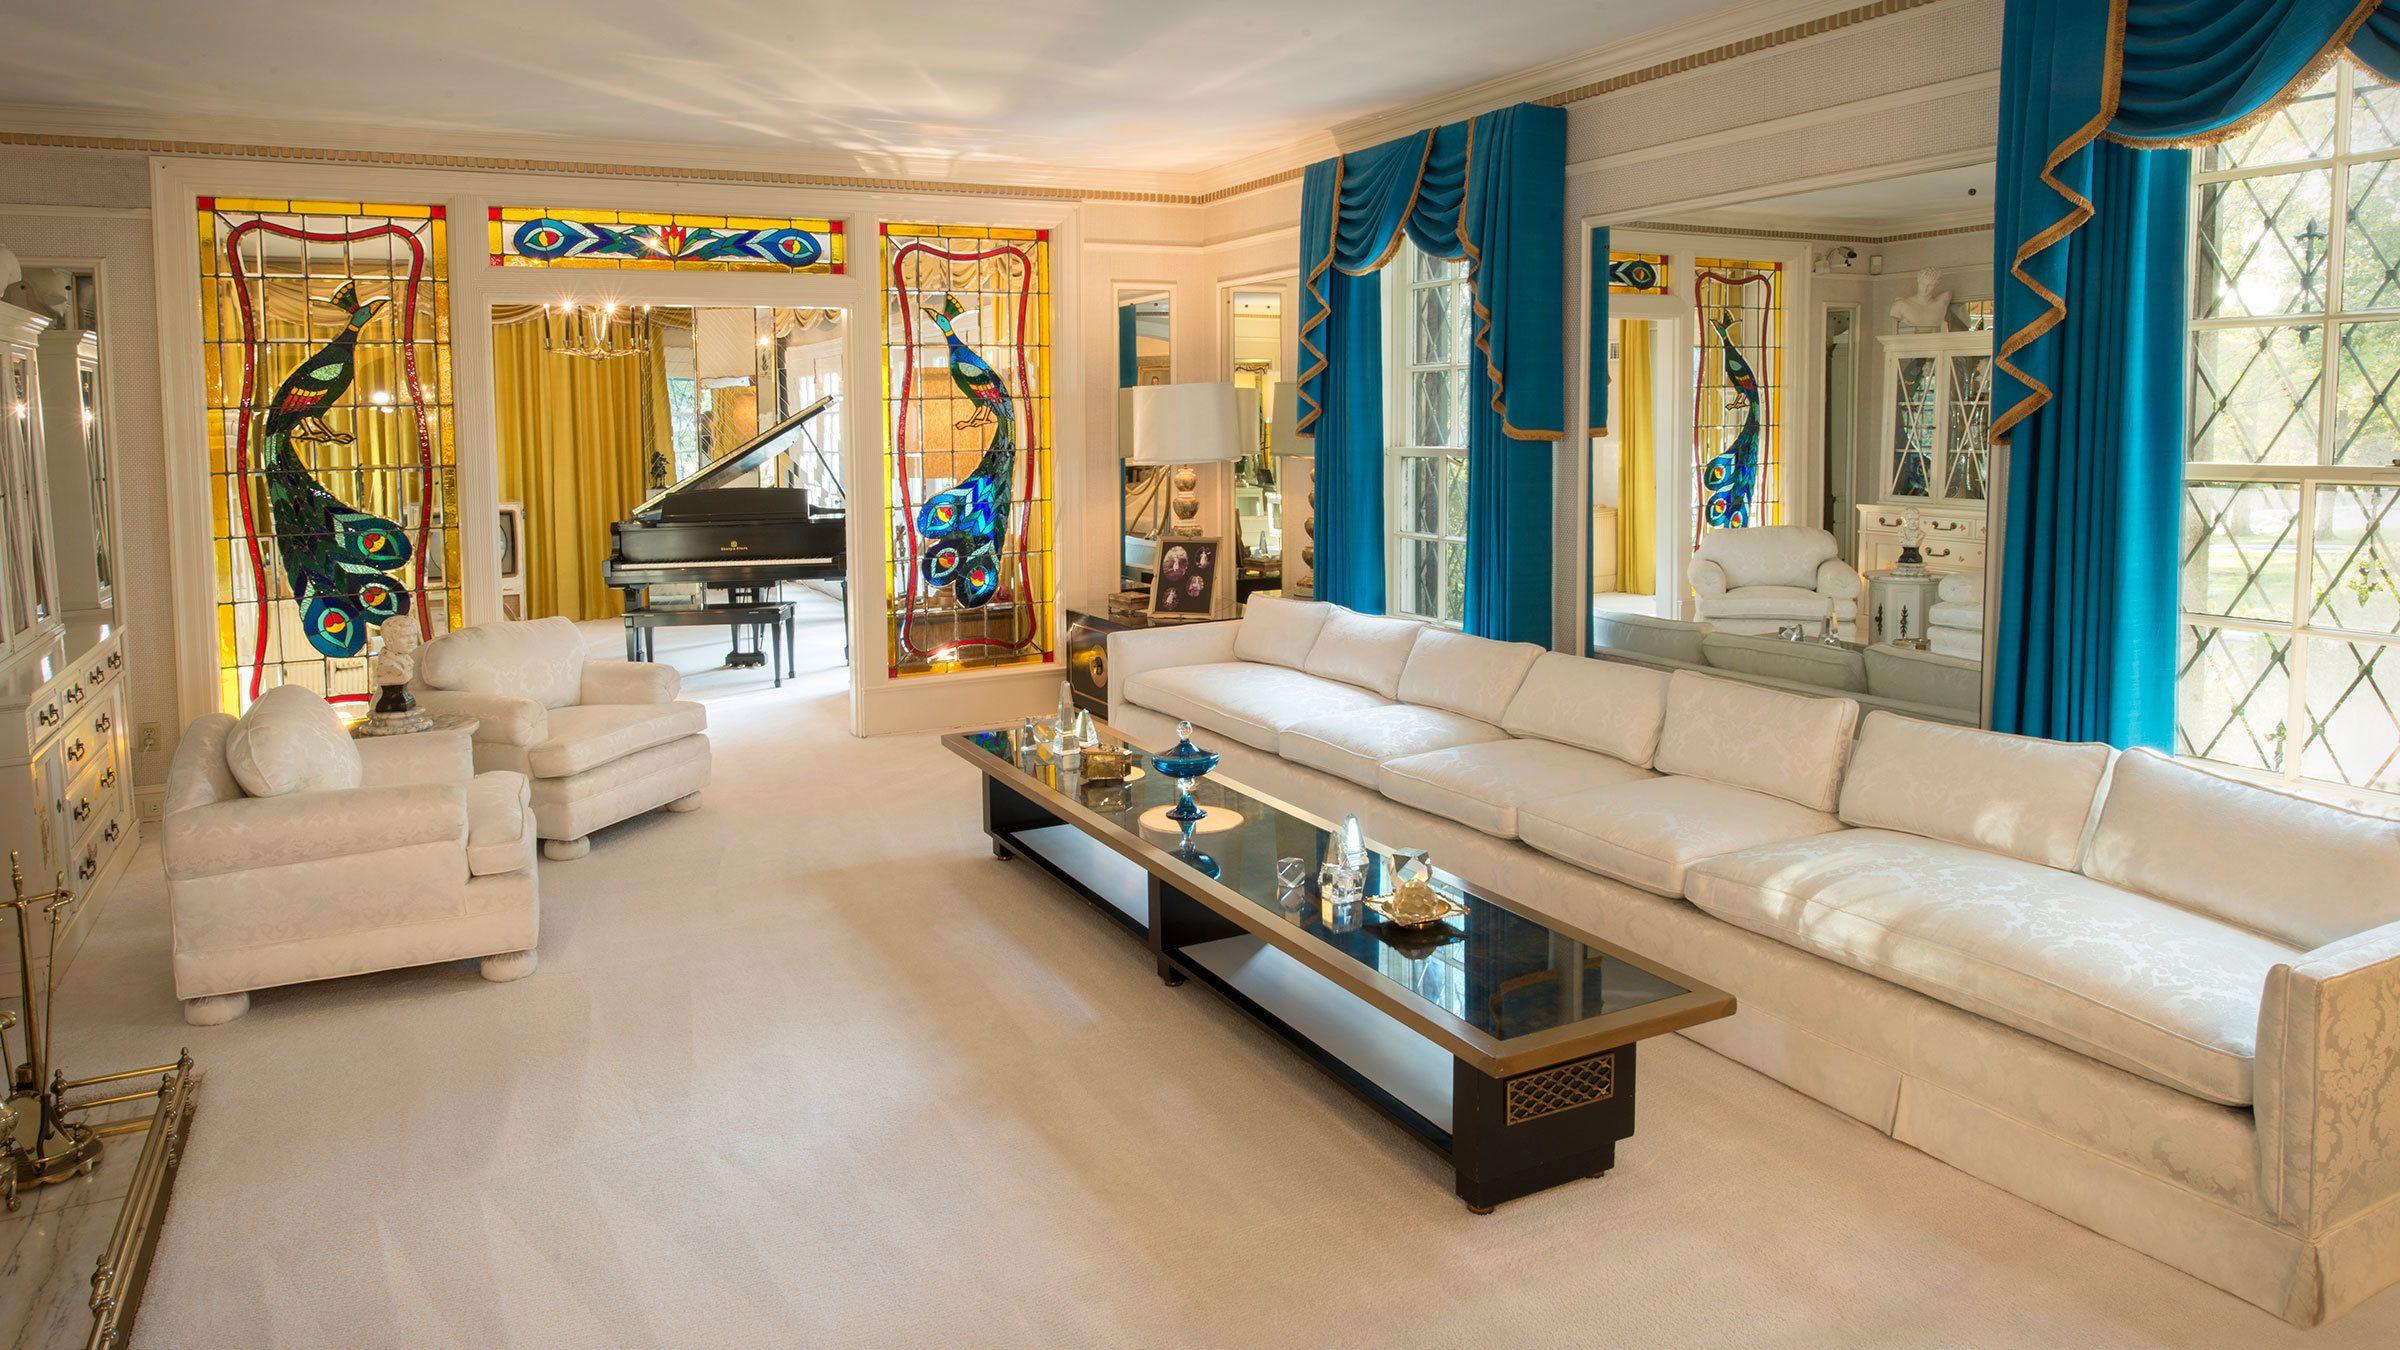 living room at graceland in memphis